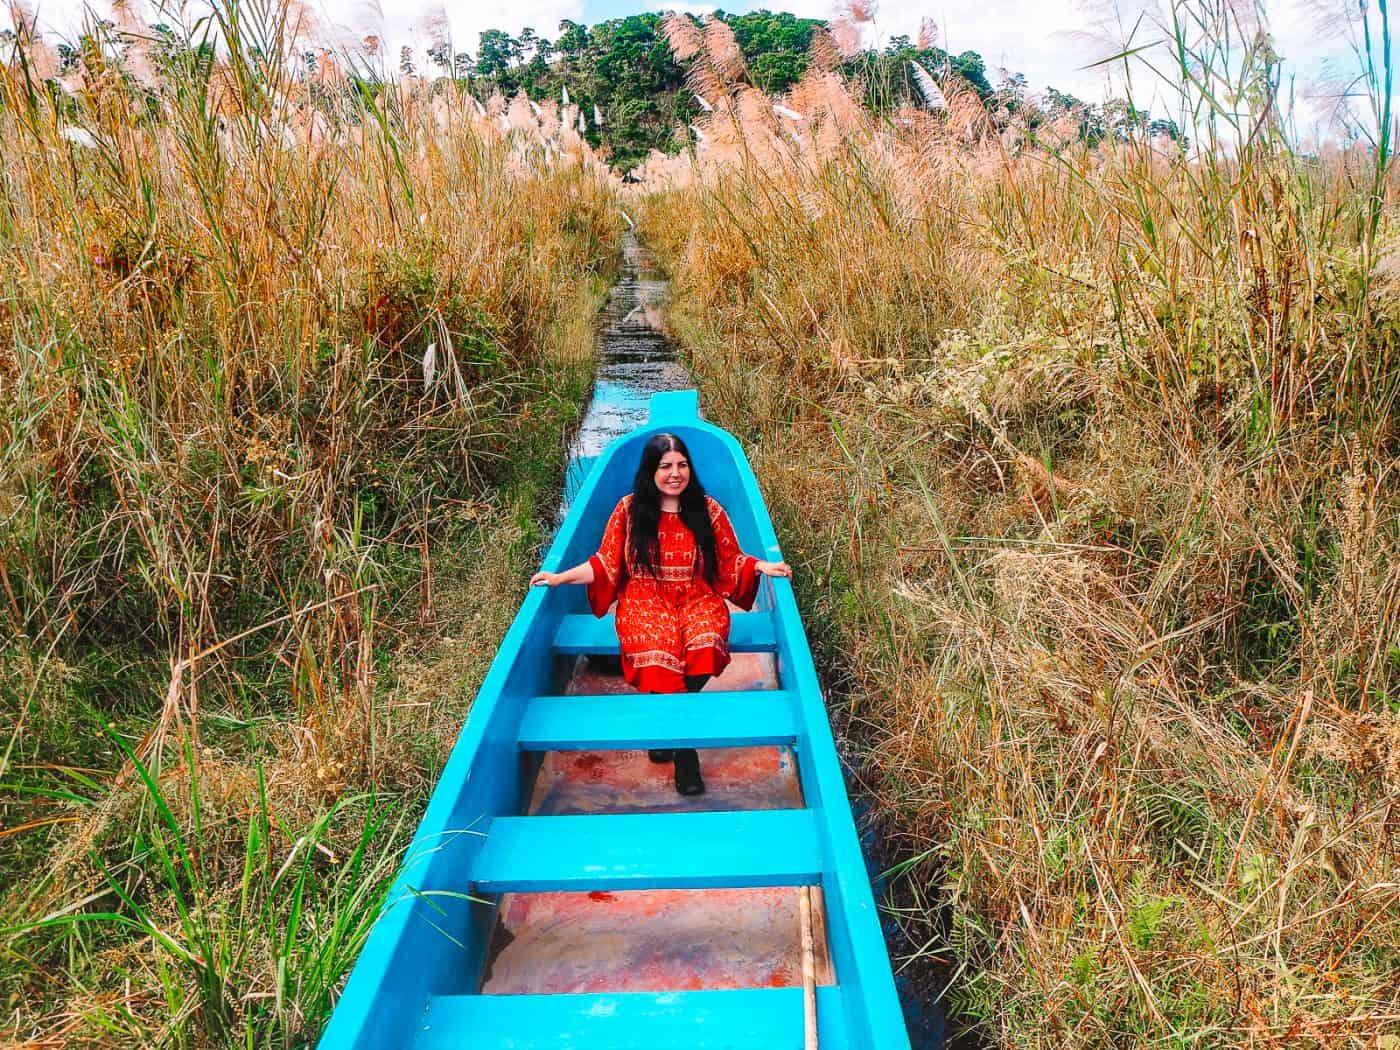 Boat ride in Keibul Lamjao National Park Loktak Lake Sangai